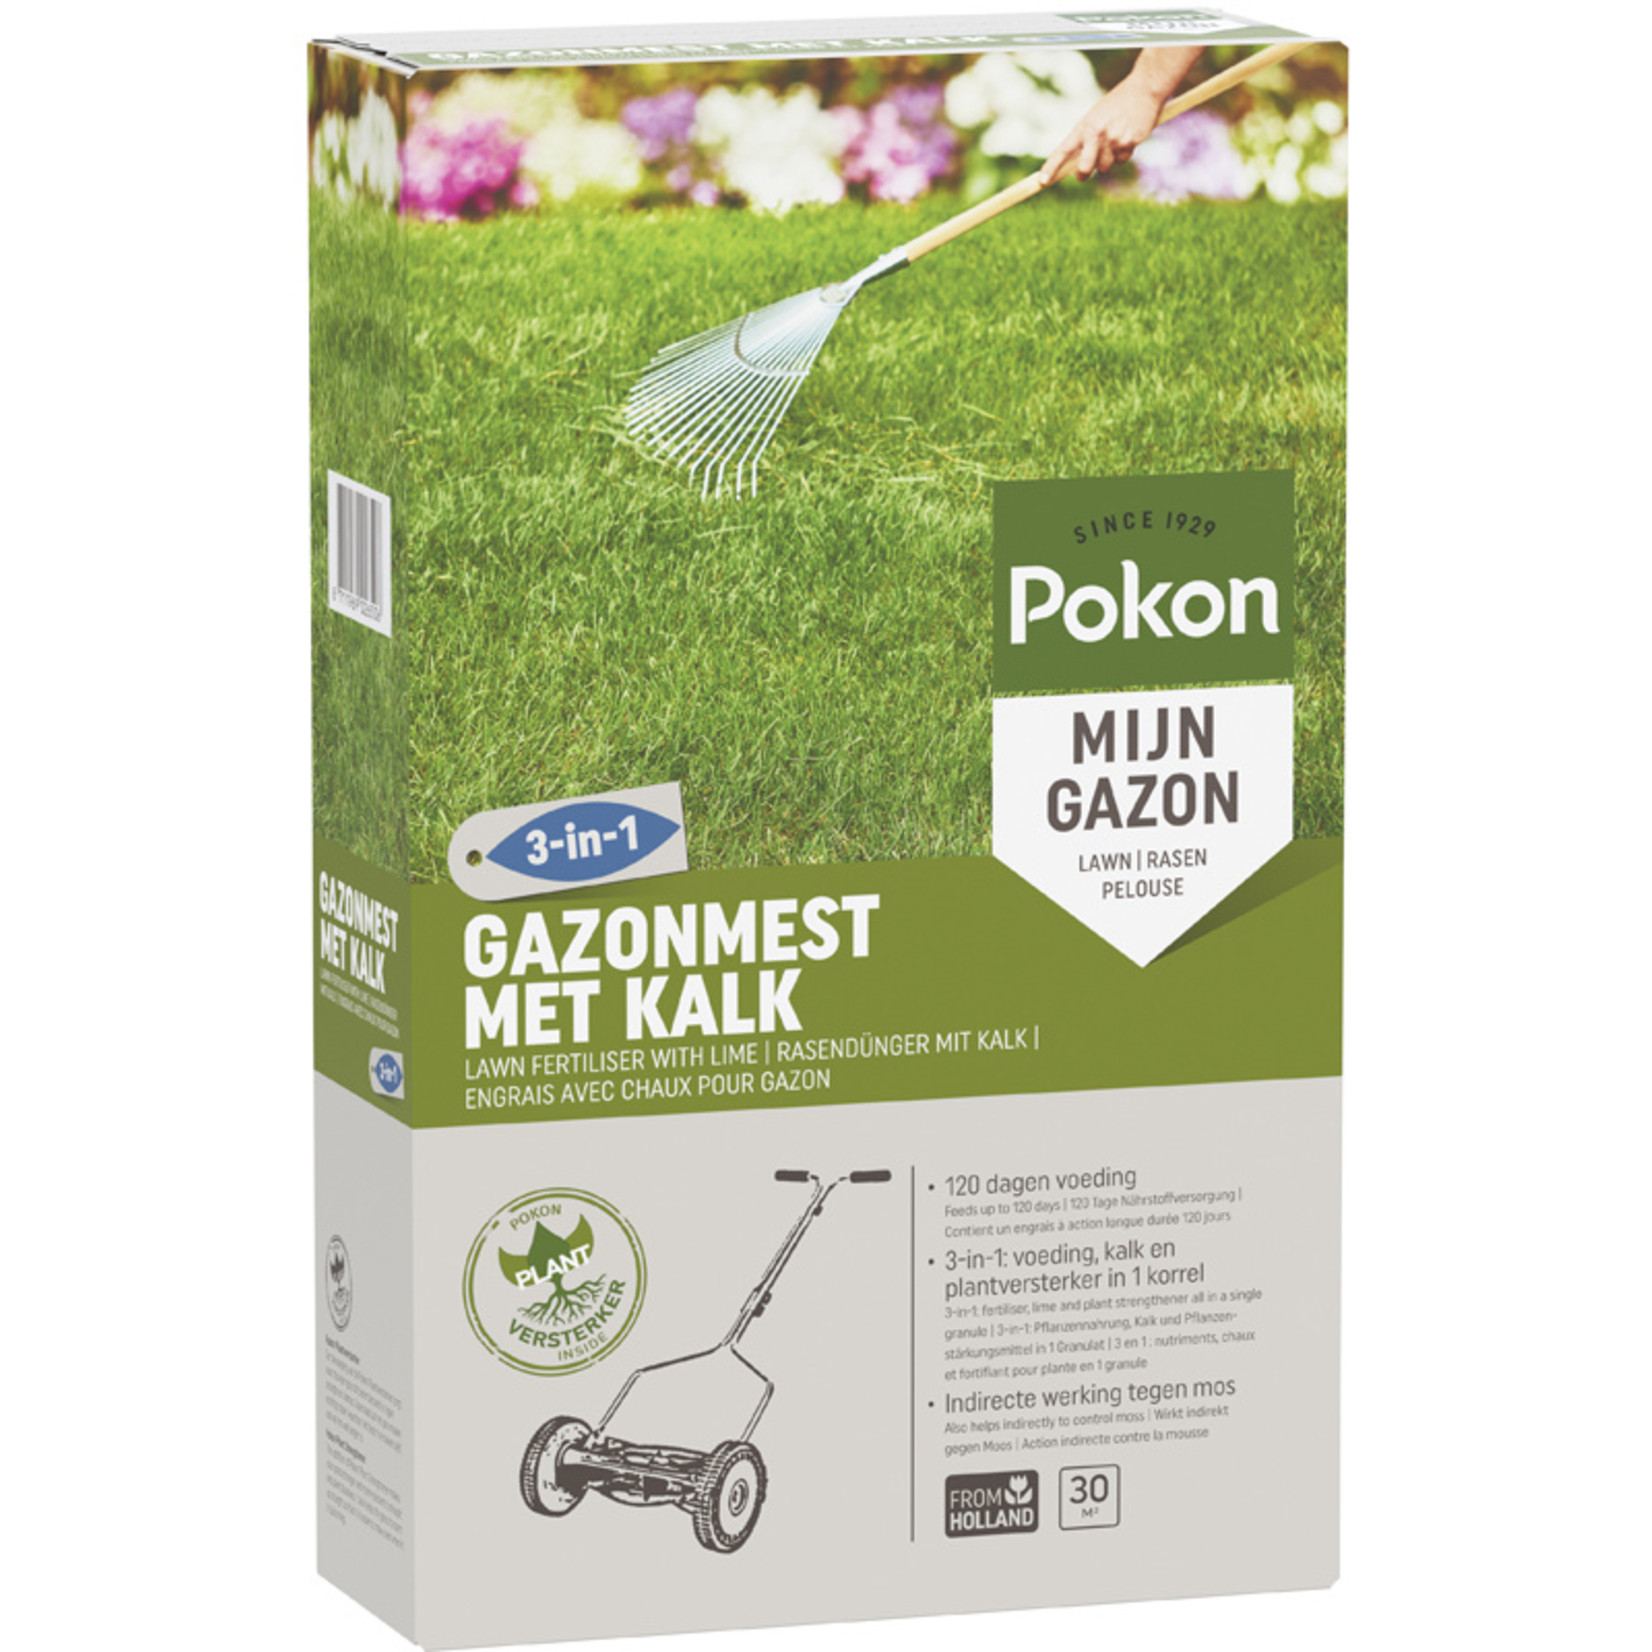 Pokon Gazonm + kalk 3-in-1 30m2